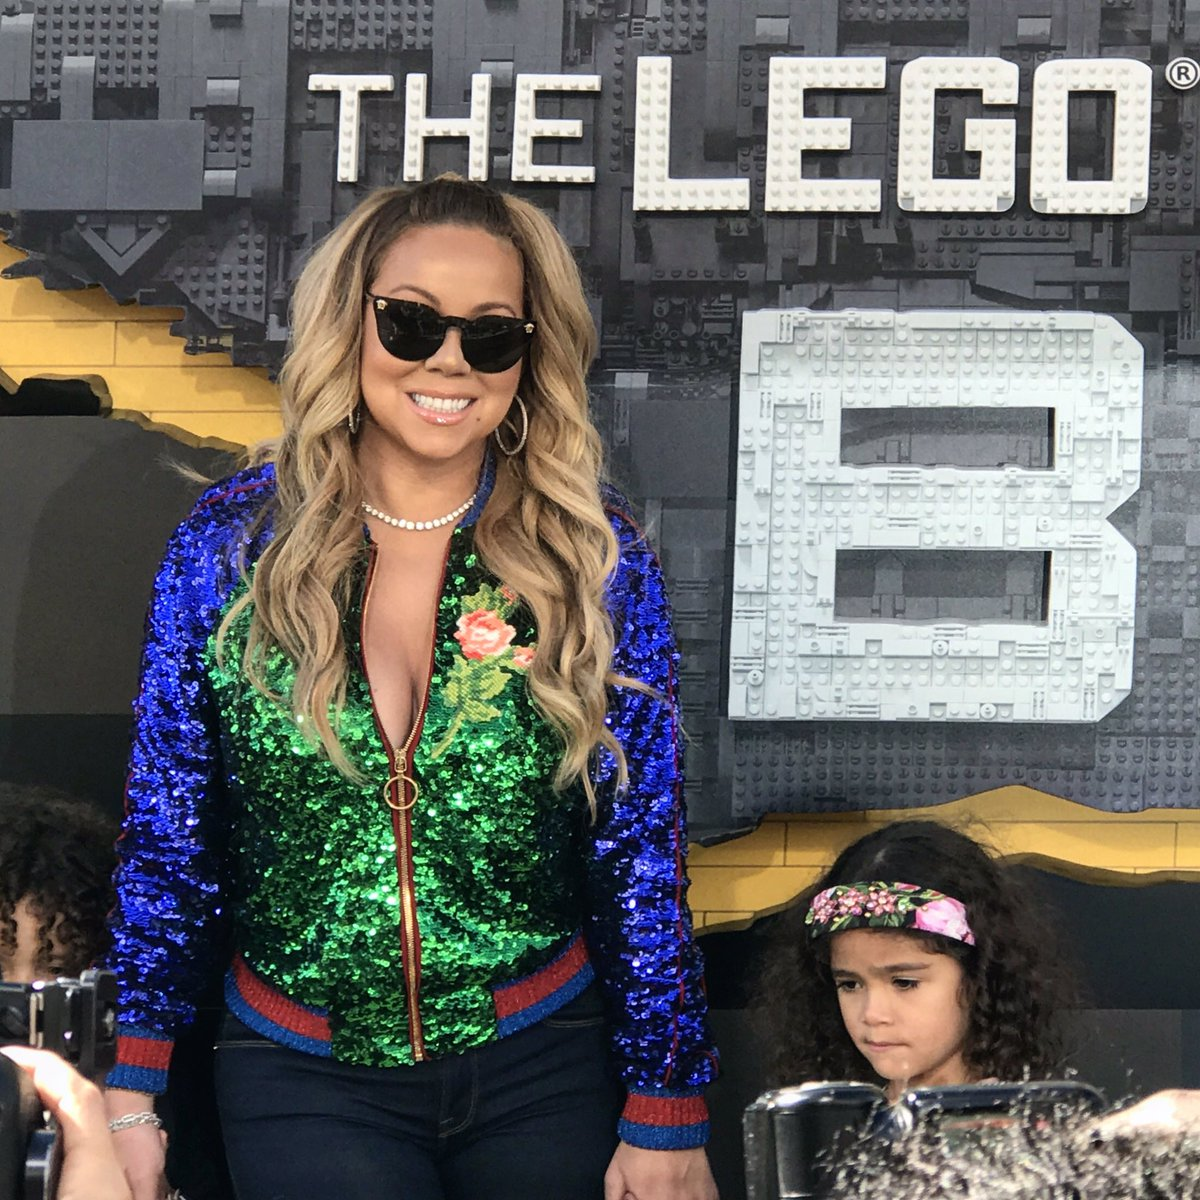 Mariah Carey arrives #Lego #LegoBatman #legobatmanmovie #legobatmanpremiere @LEGOBatmanMovie https://t.co/nK3IQ3pcBr